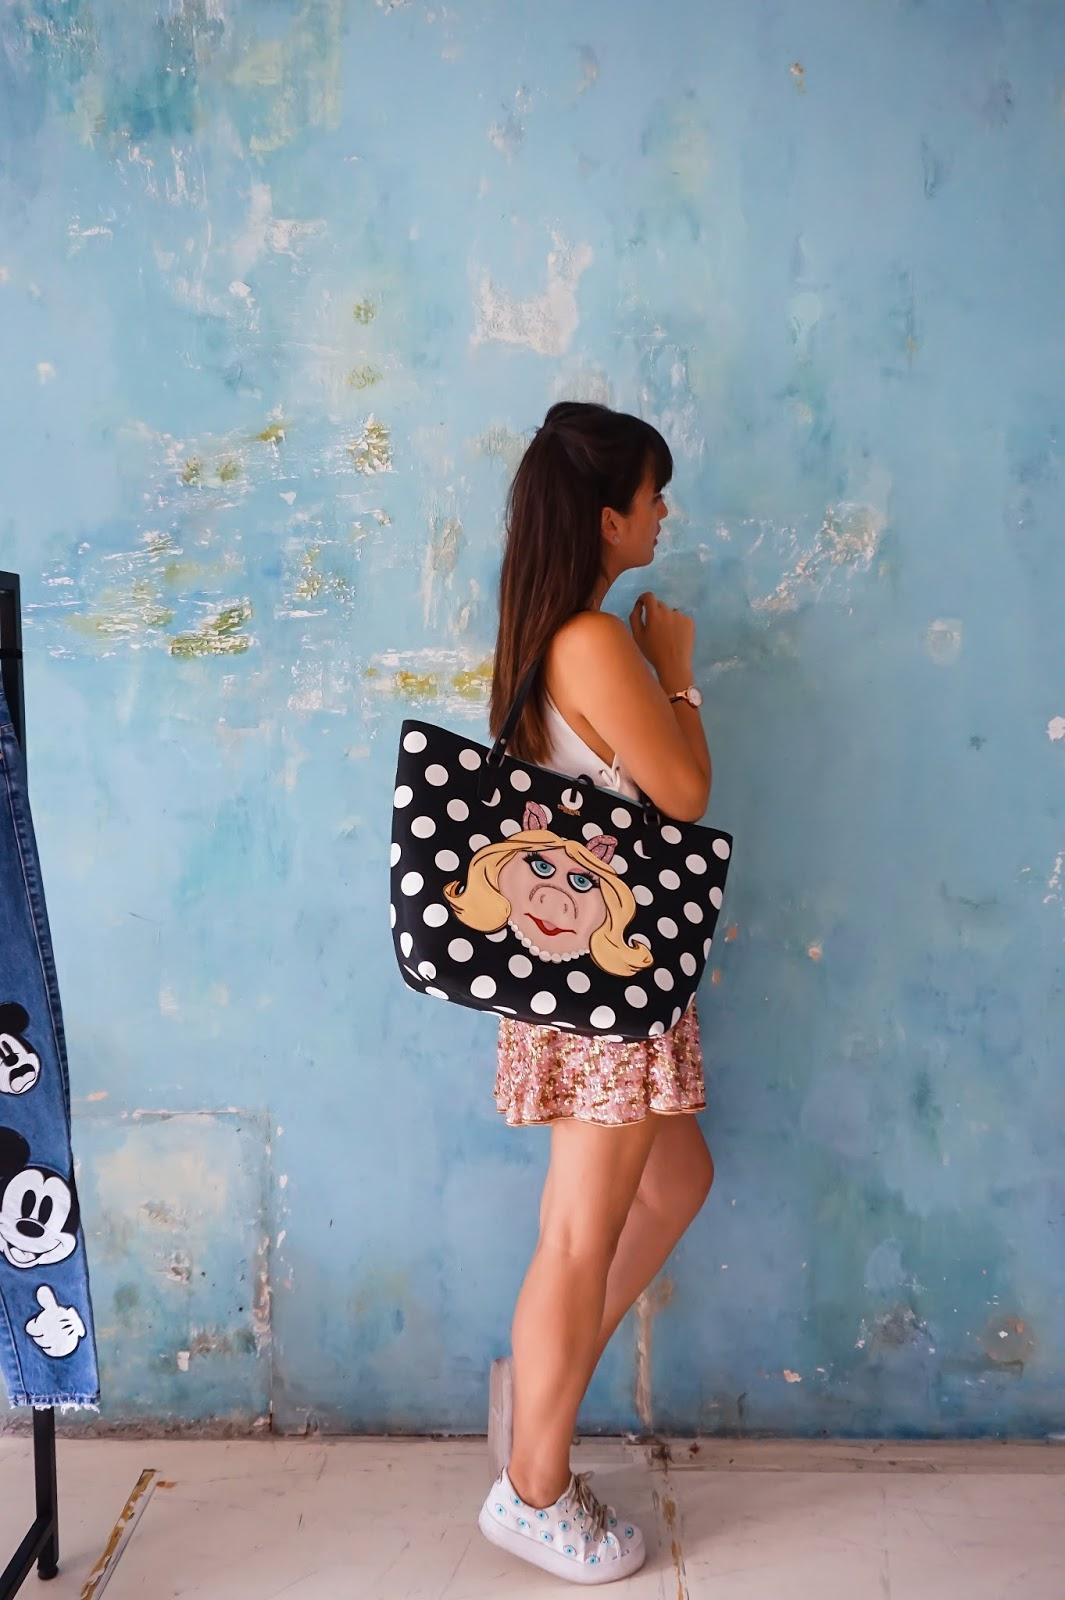 disneyfashionlab-disneyfashion-paris-blogger-mode-style-look-fashion